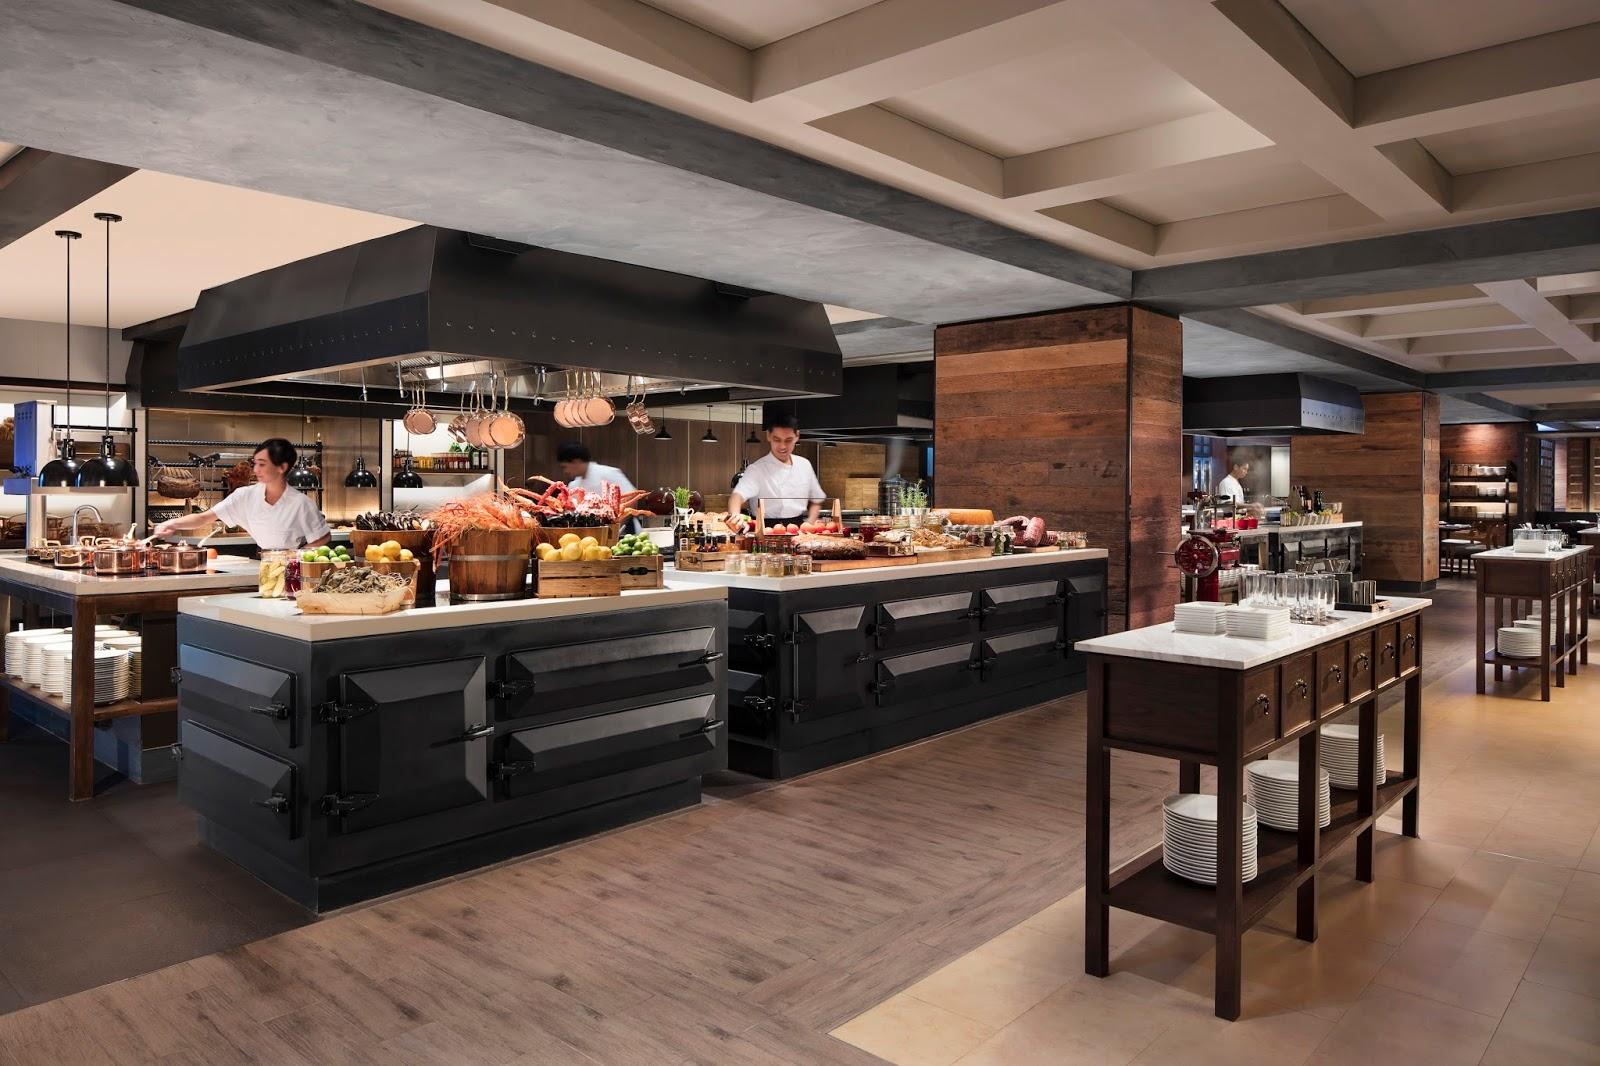 Amazing Restaurant In Bangkok-Goji Kitchen & Bar